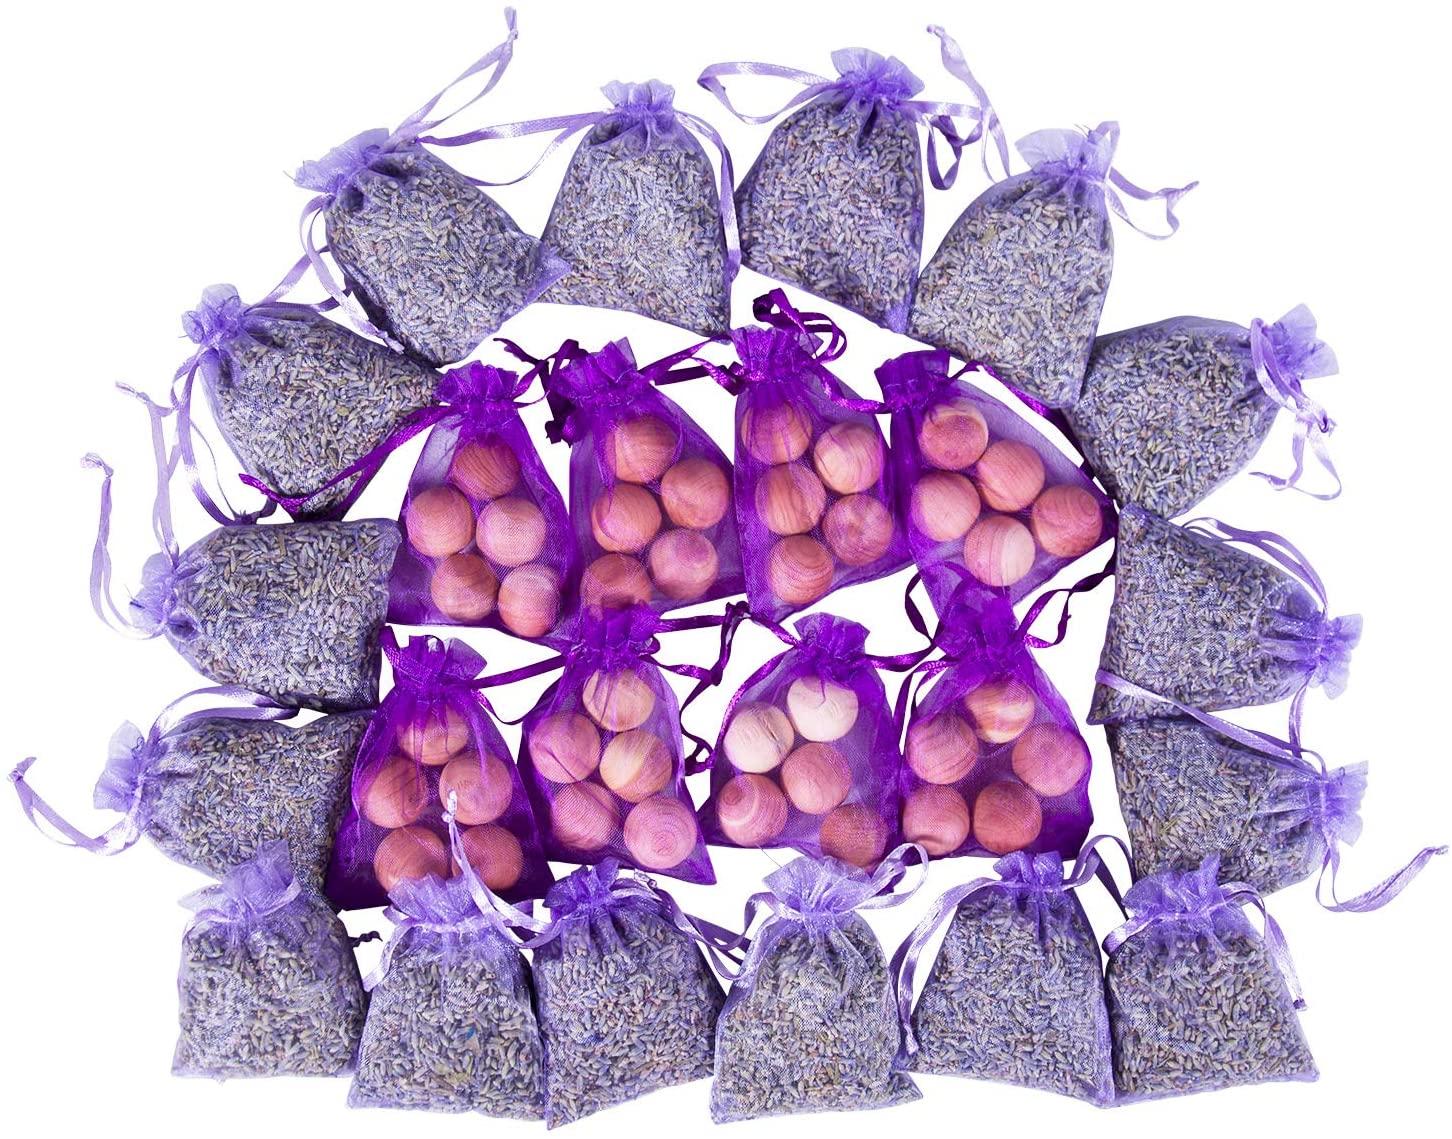 Pack of 24 Lavender Cedar Sachets Bag (16 Lavender Sachets, 8 Cedar Sachets) for Closet, Drawer, Dresser, Wardrobe and More